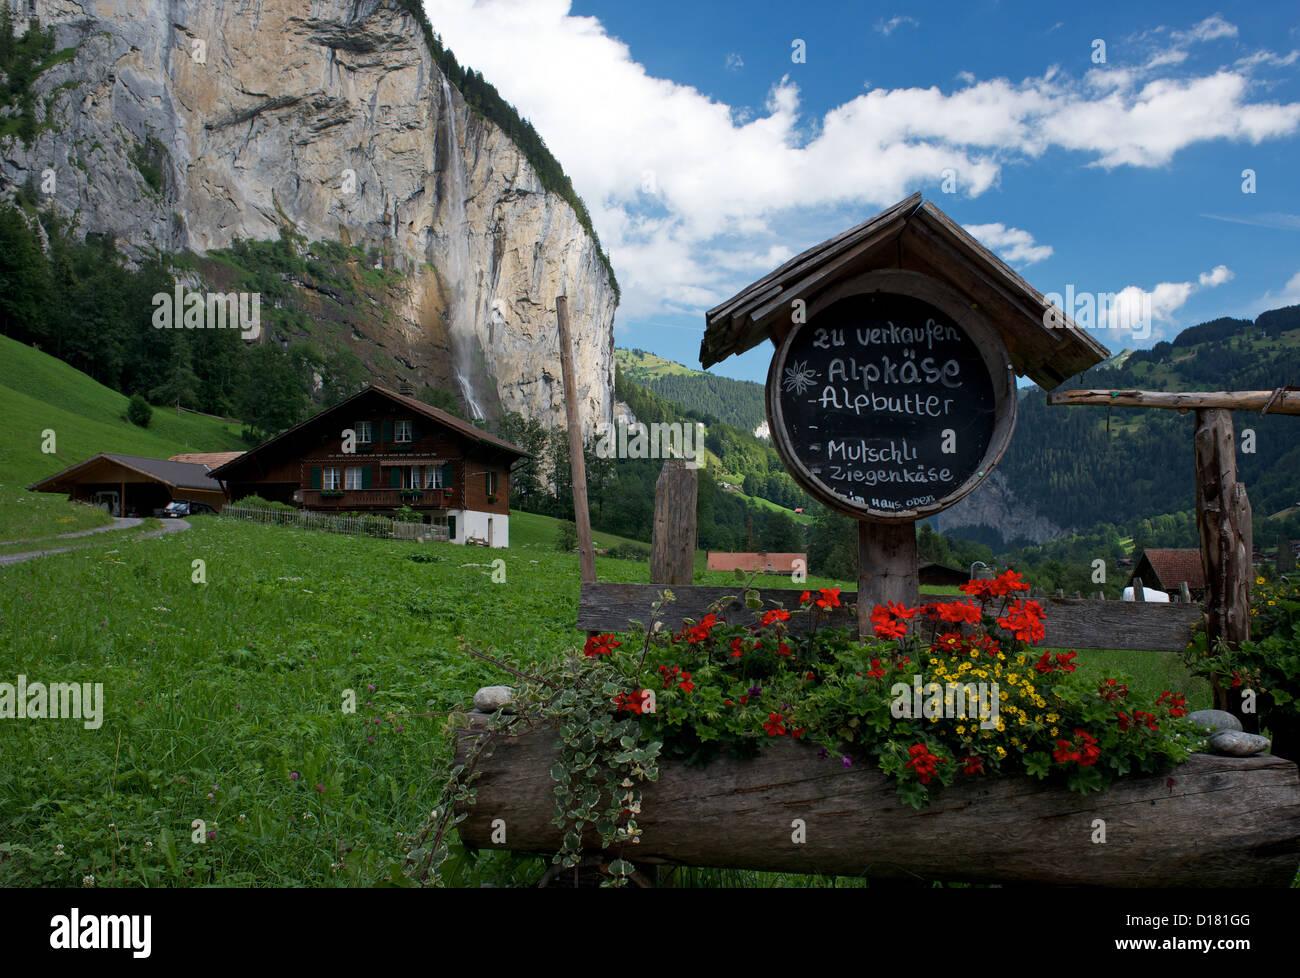 Swiss chalet in Lauterbrunnen Valley Switzerland - Stock Image